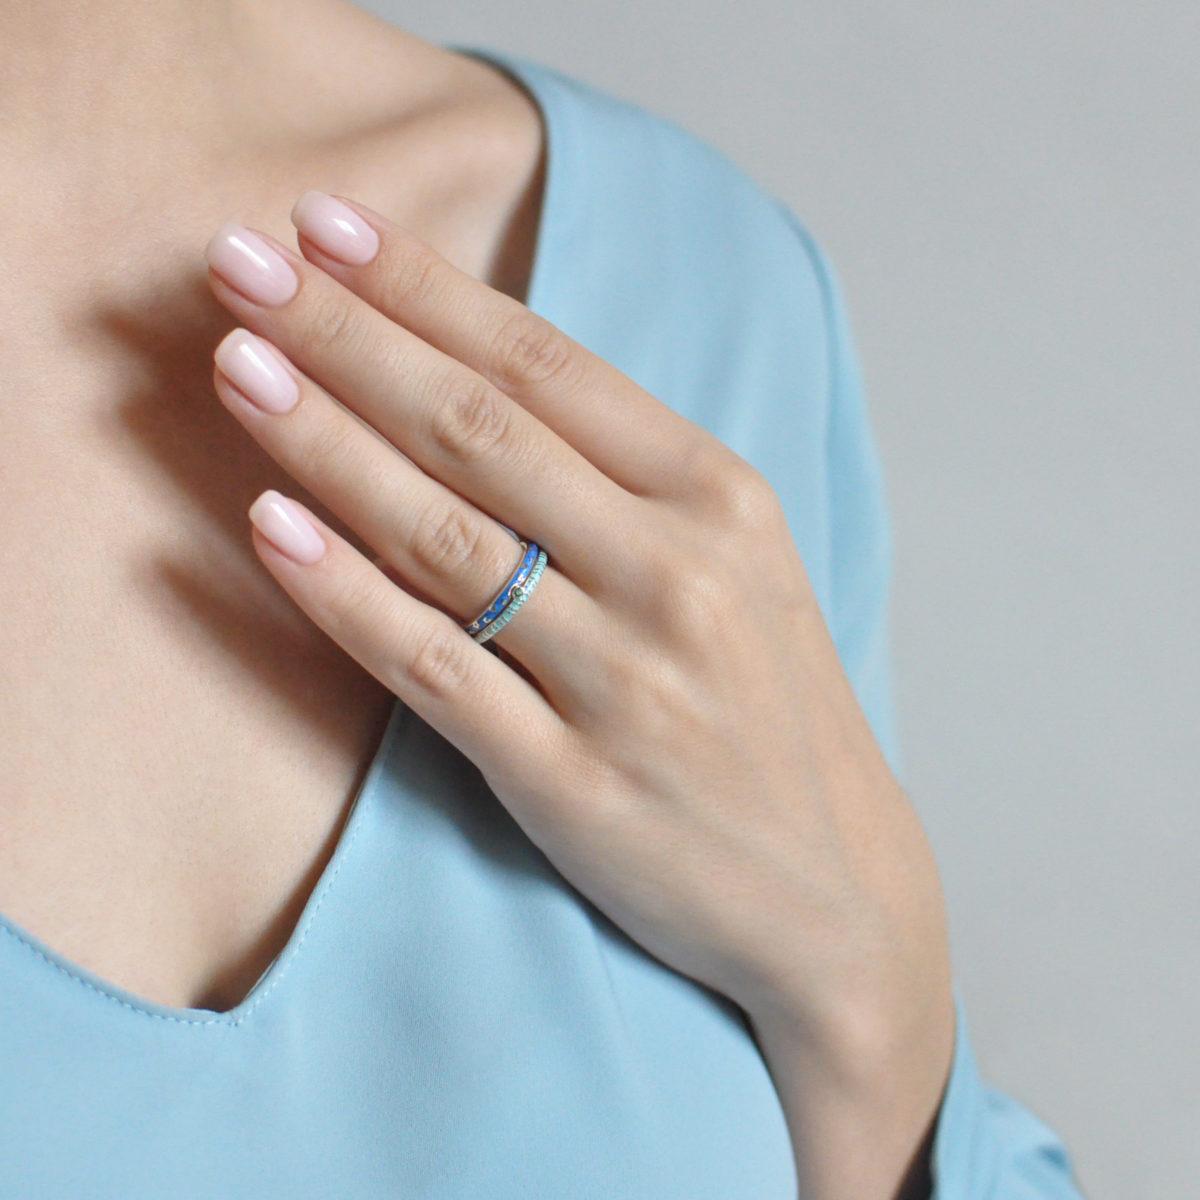 princzessa na goroshine 61.161 1200x1200 - Кольцо из серебра «Принцесса на горошине», сине-голубое с фианитами